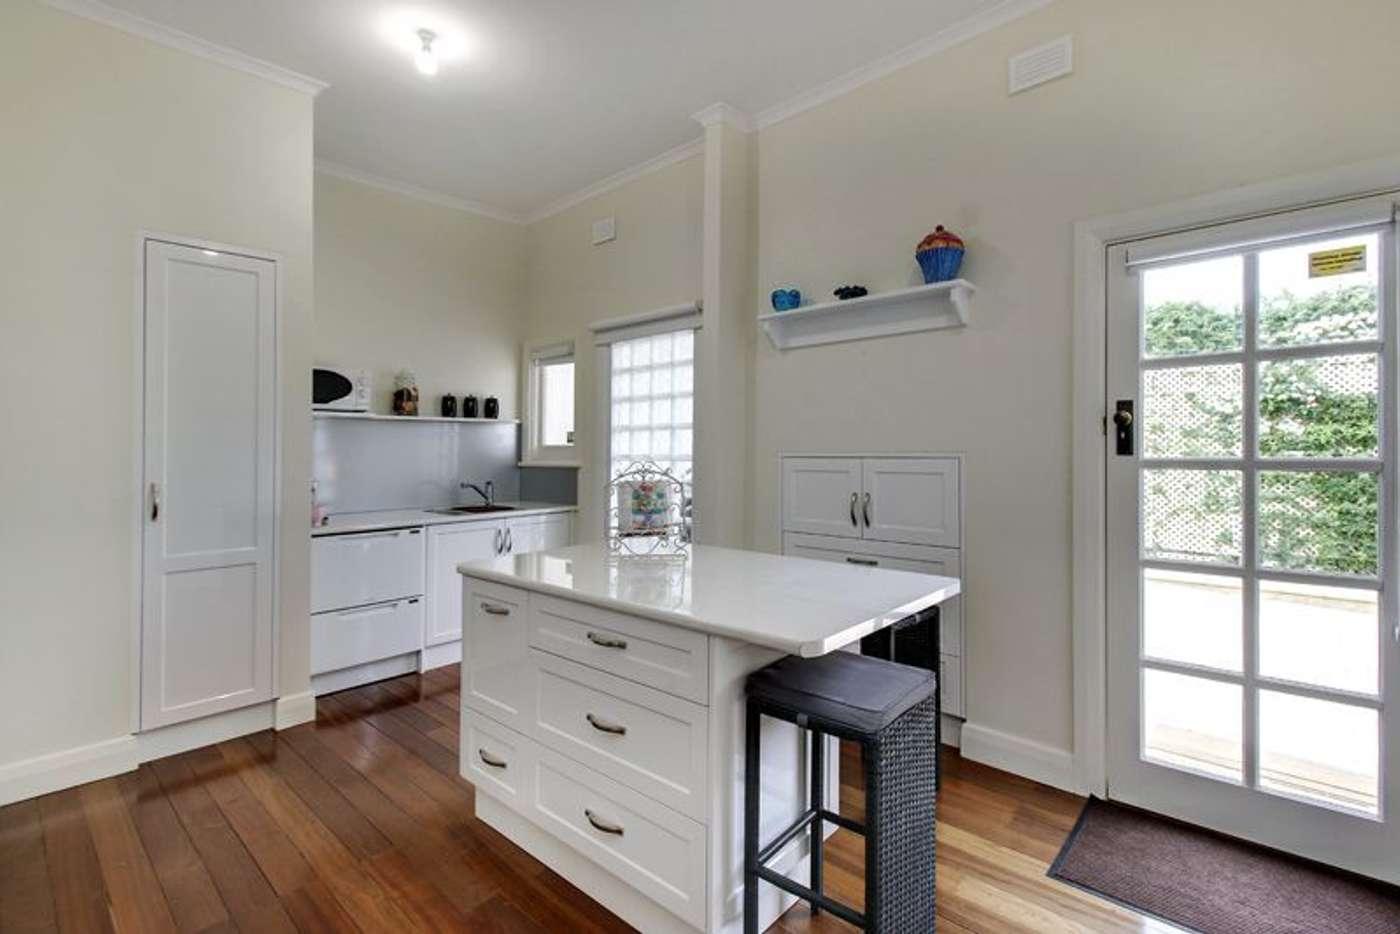 Fifth view of Homely house listing, 3 O'Hanez Street, Berri SA 5343